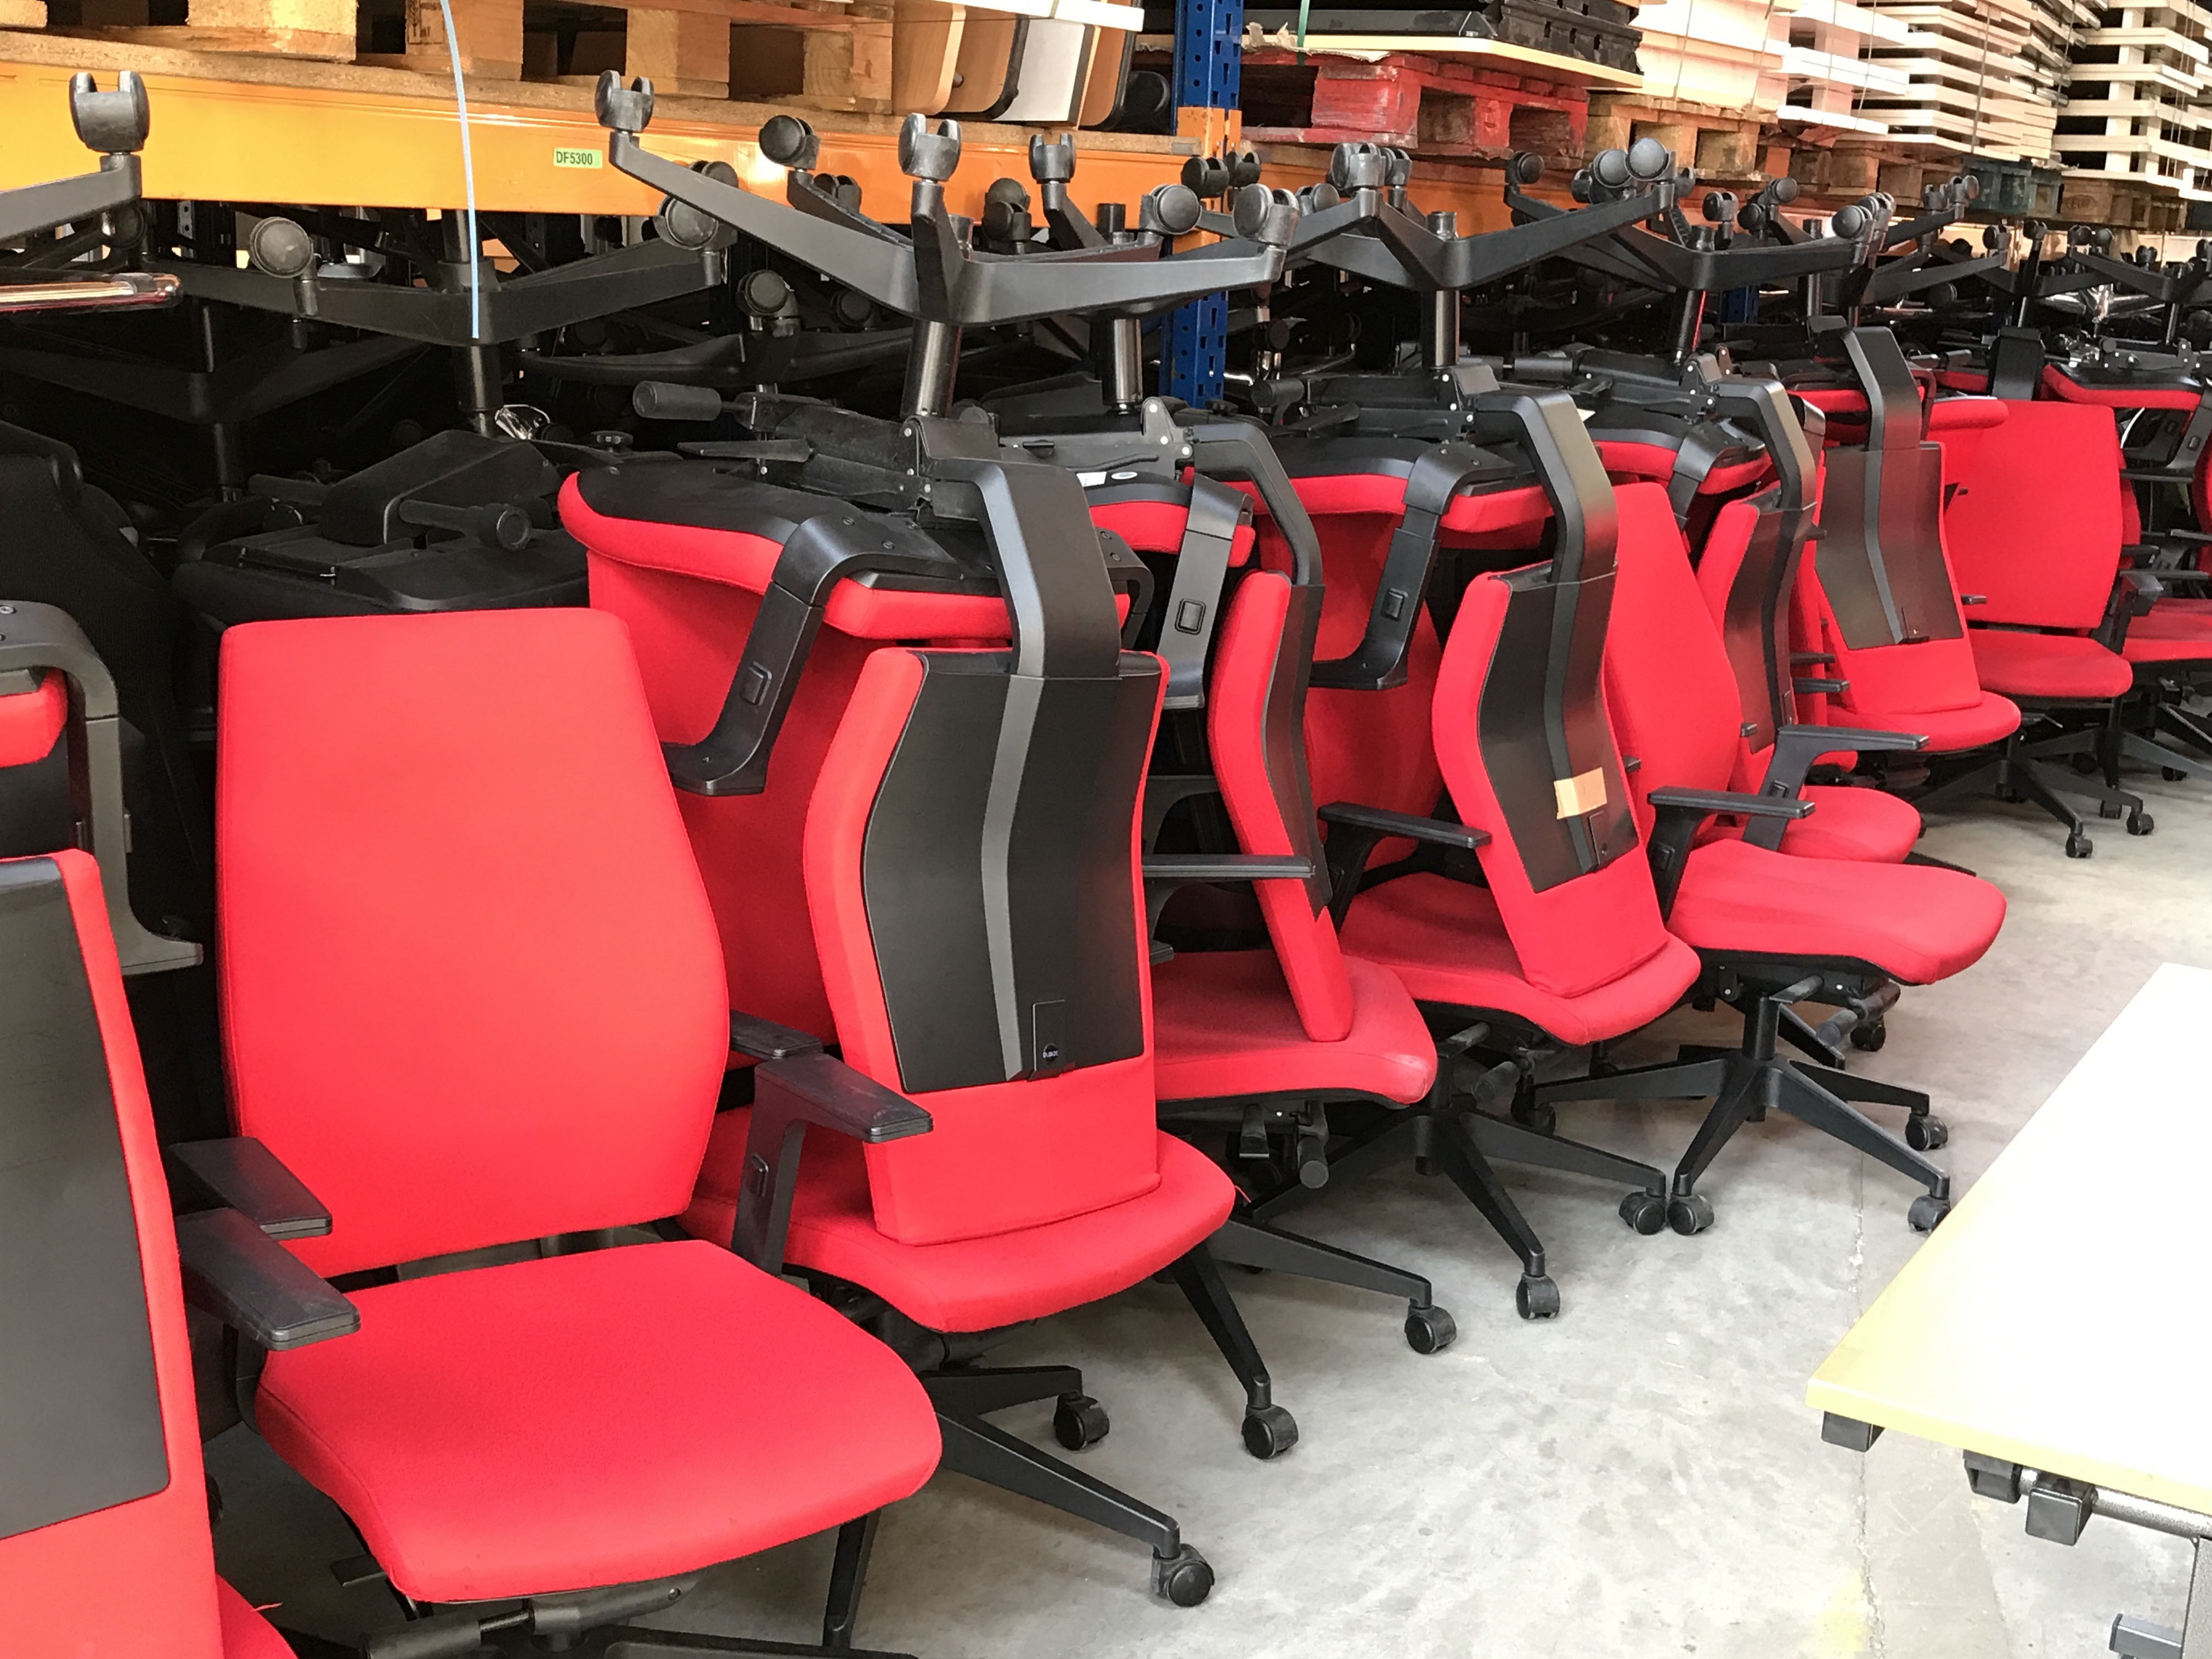 Tricycle office mobilier bureau occasion fauteuil de bureau